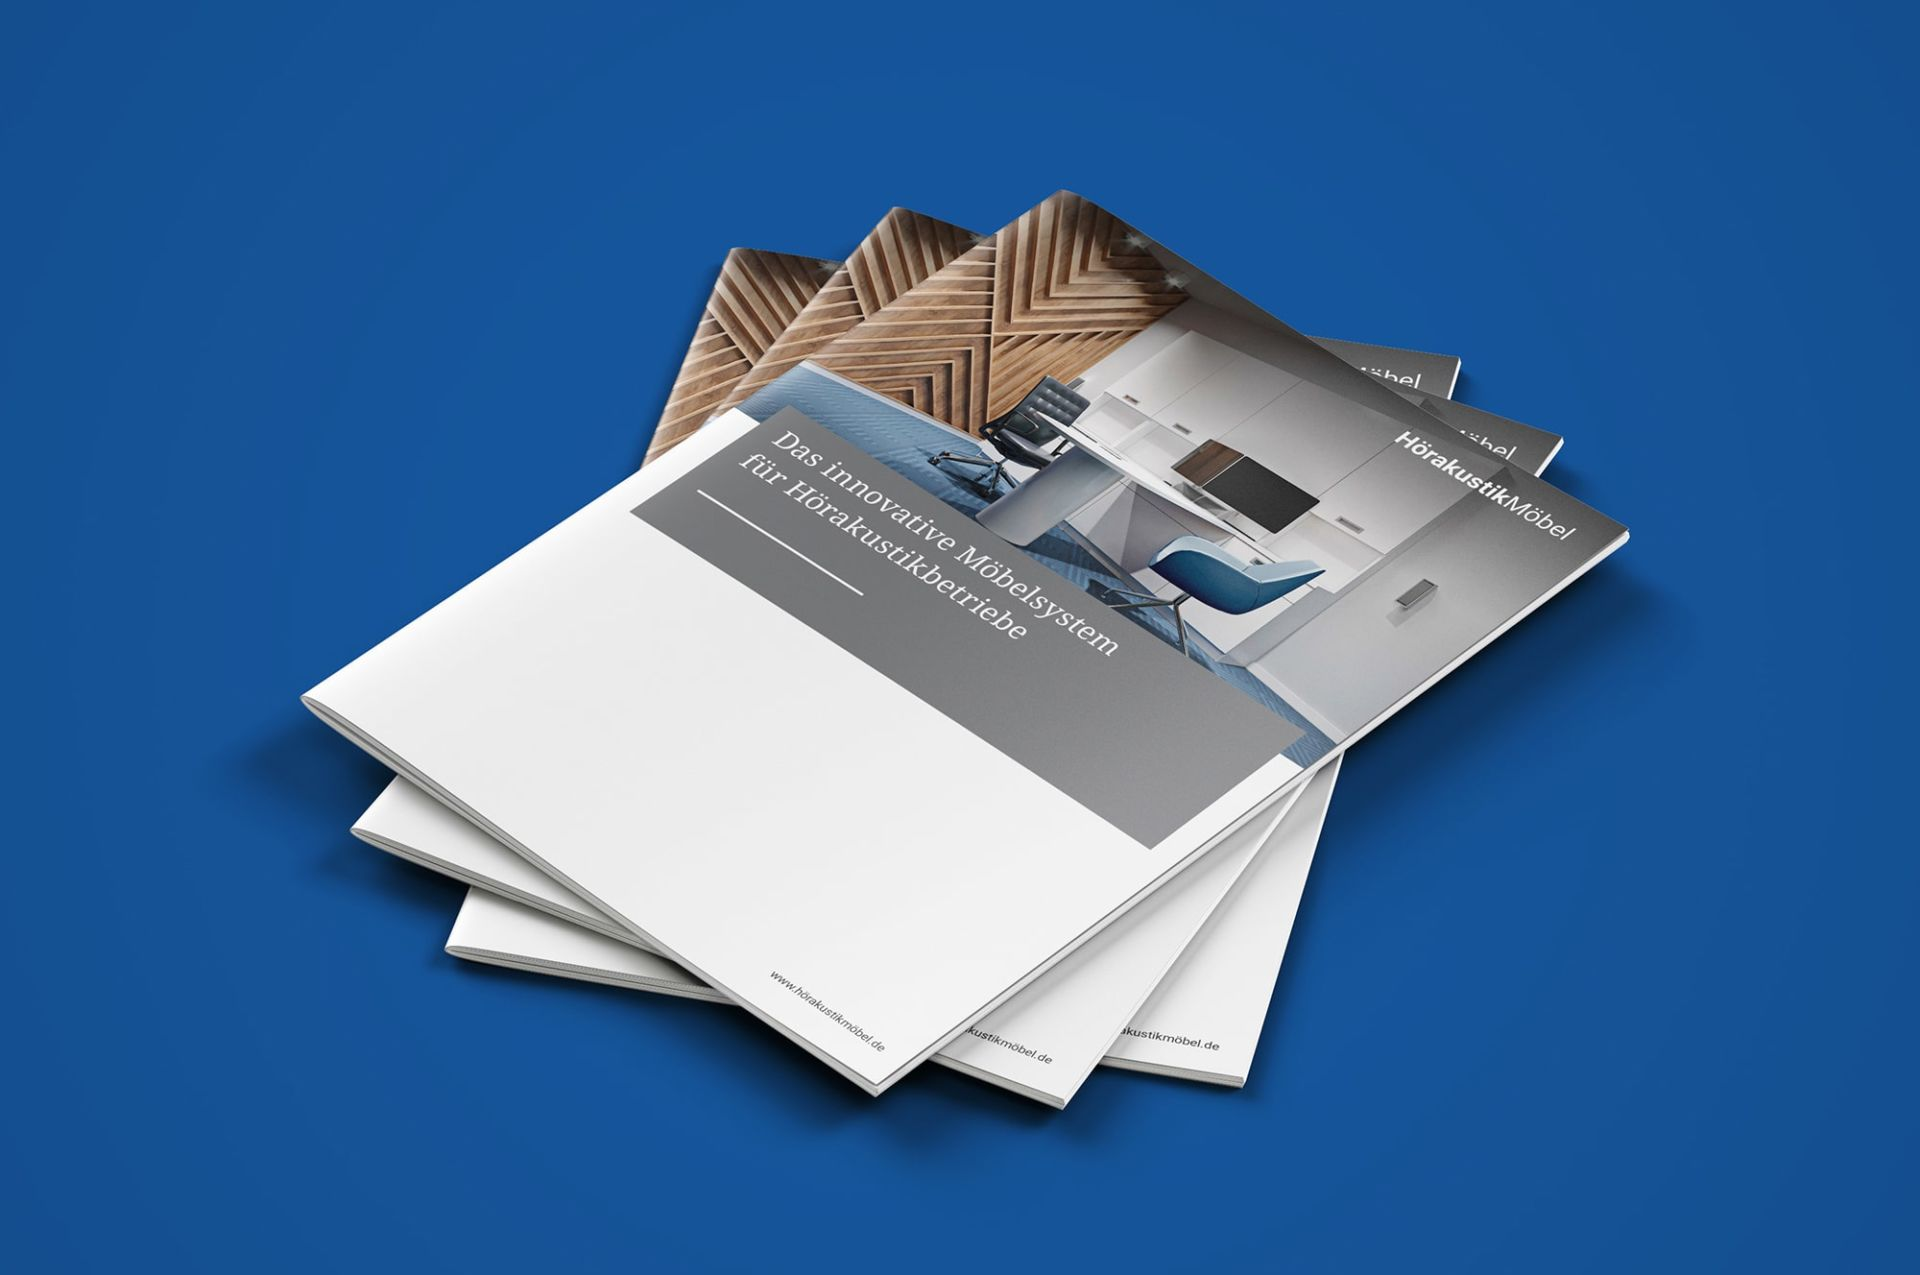 HearingPro_A4_Brochure_Mockup_001